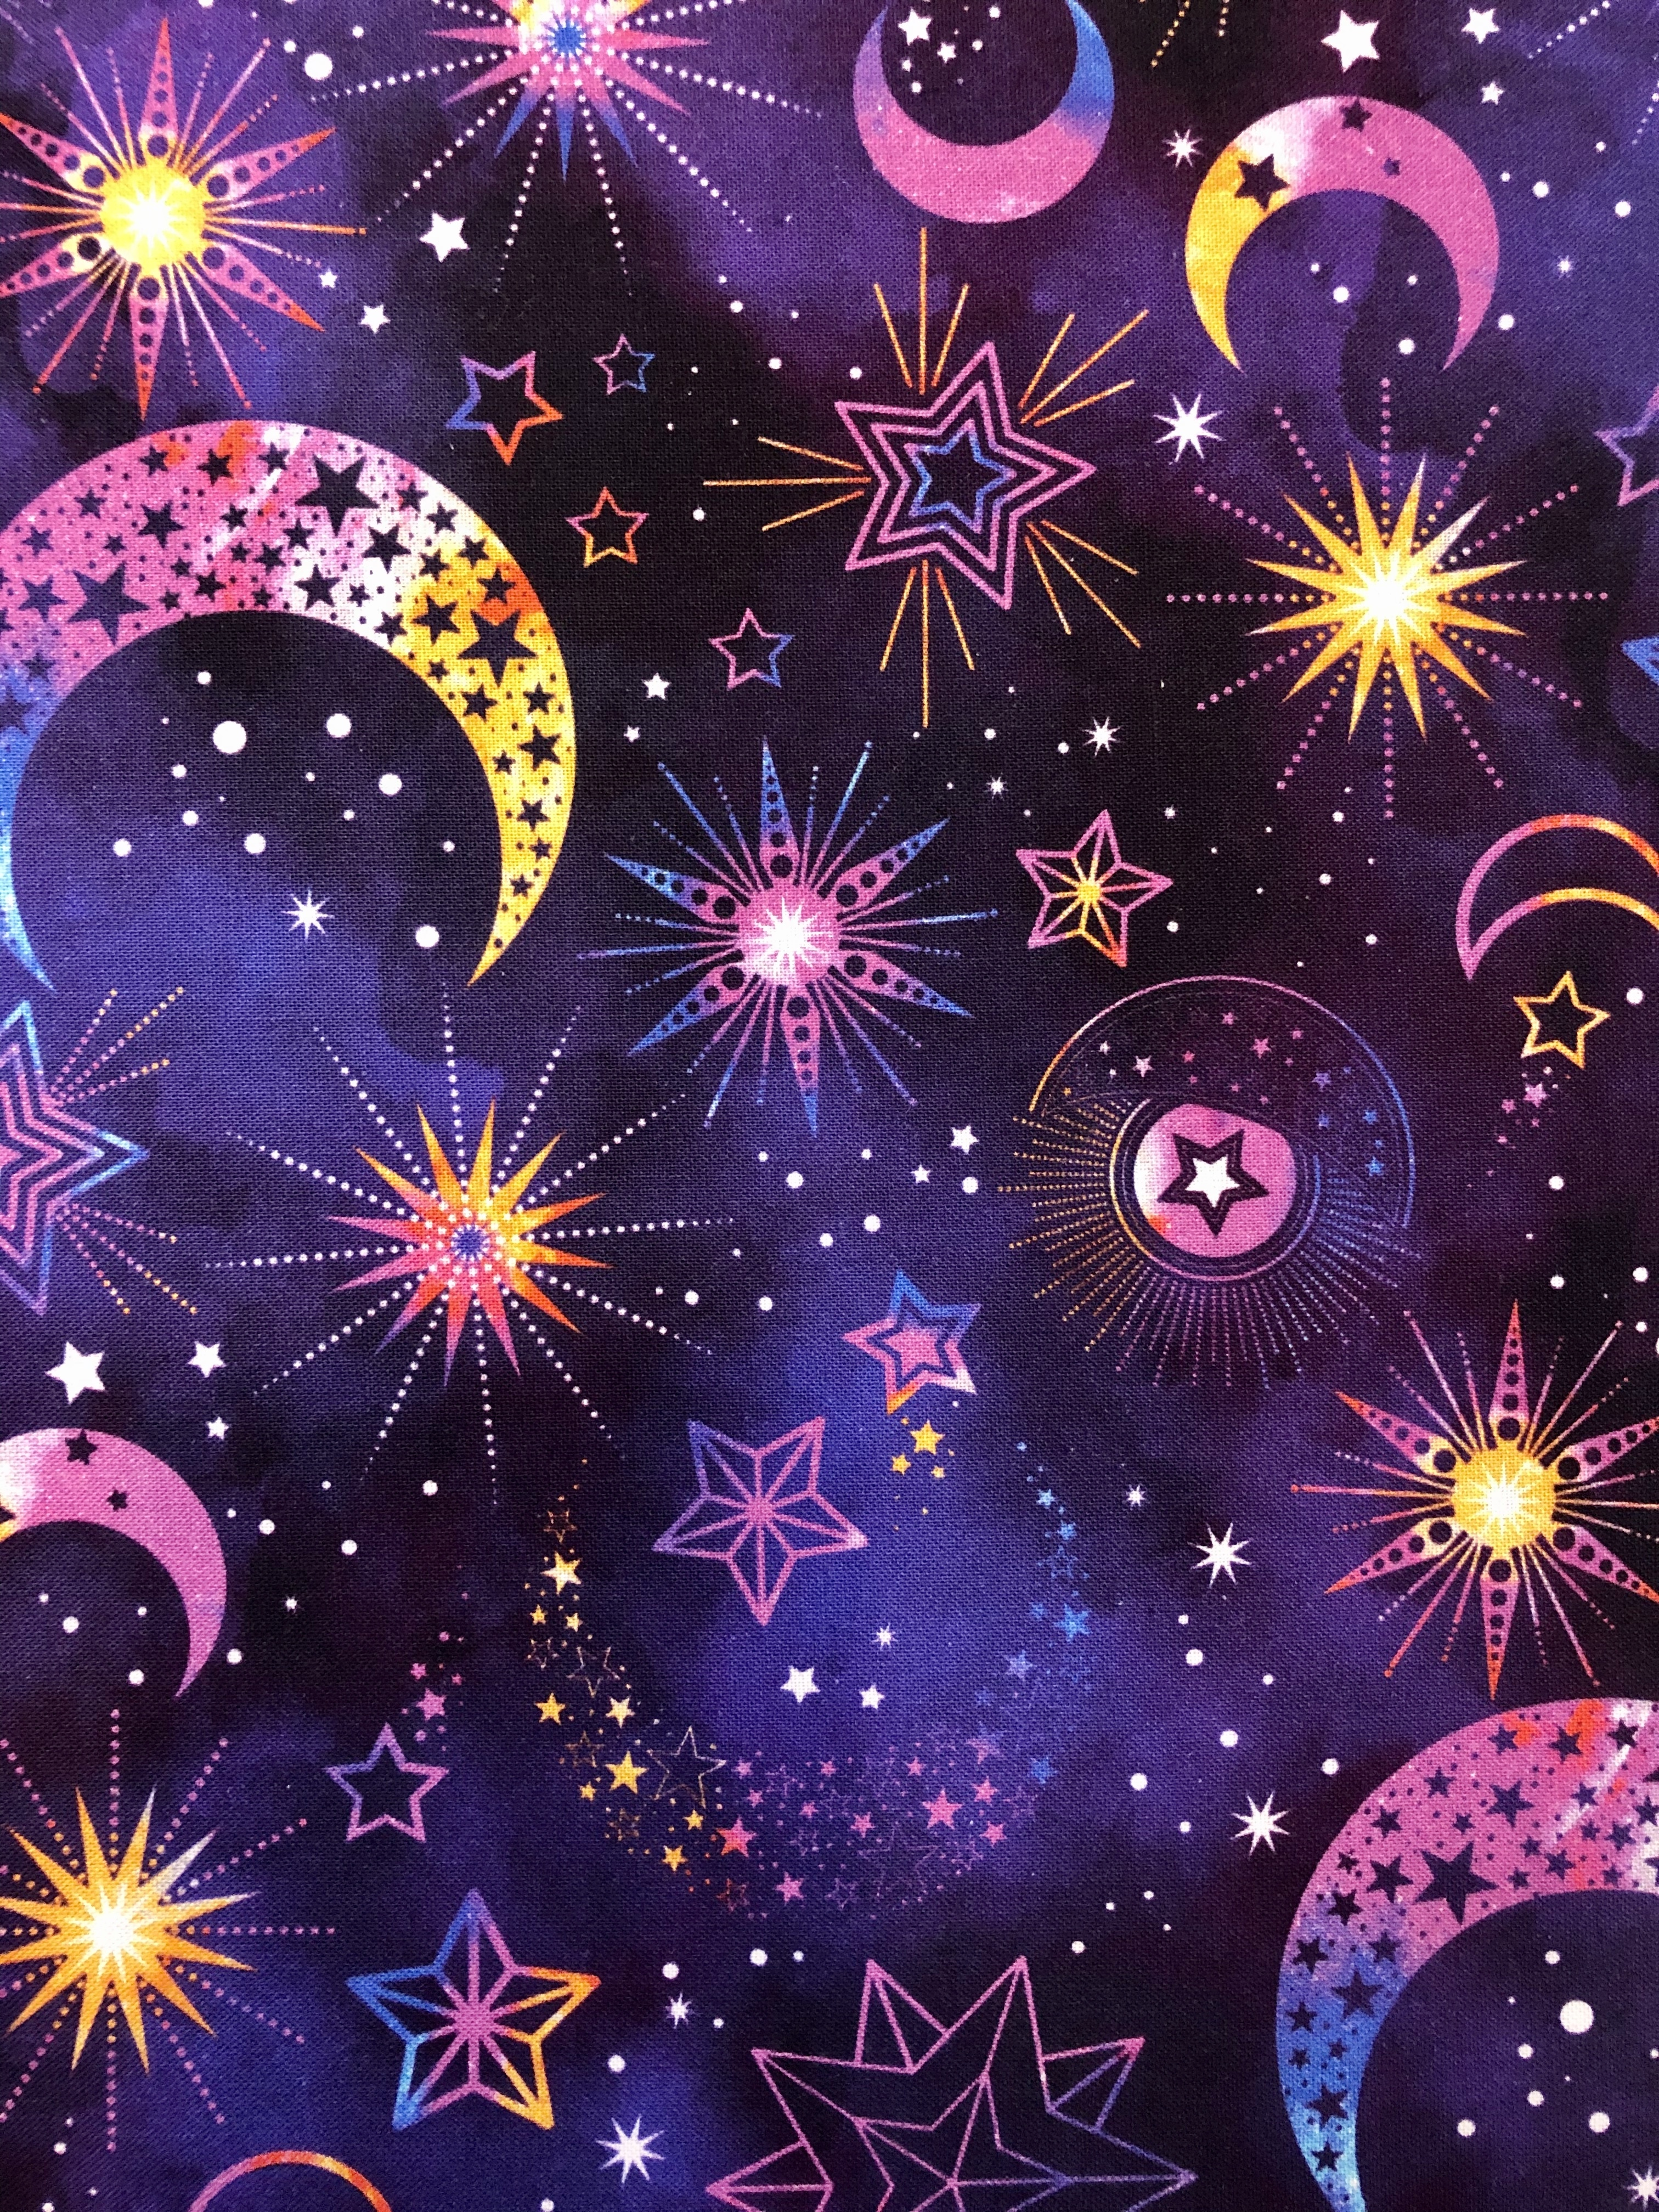 Cosmic Universe - Purple Allover - 1/2m cut 55456